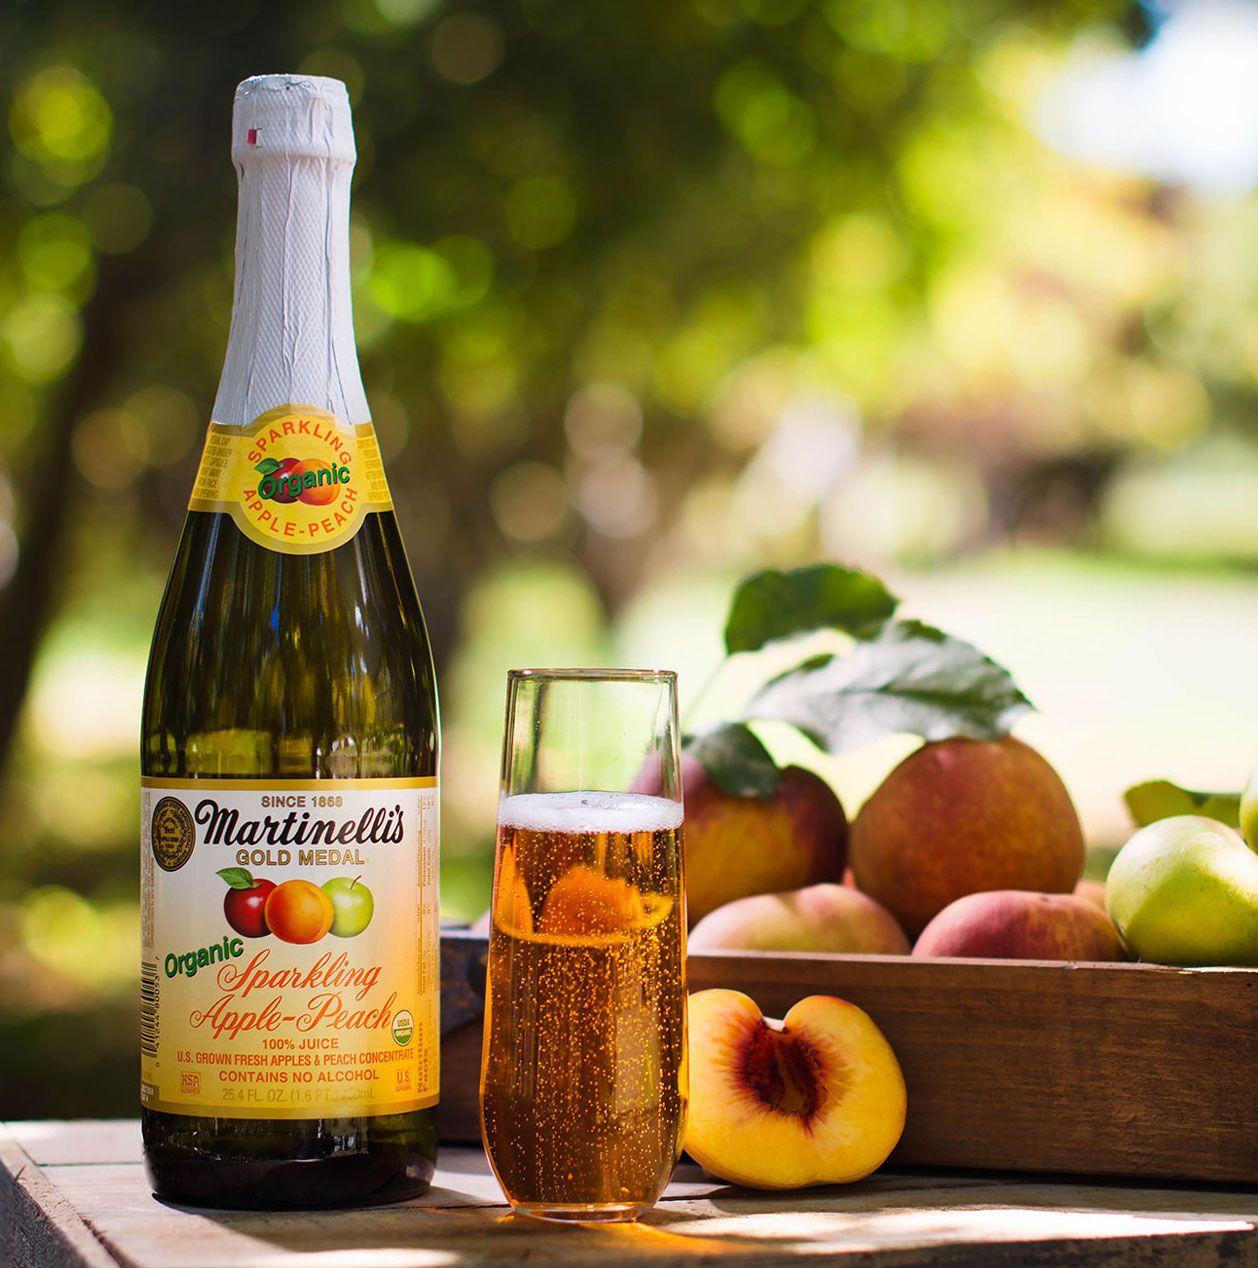 Sparkling ApplePeach Juice Sparkling Juices S